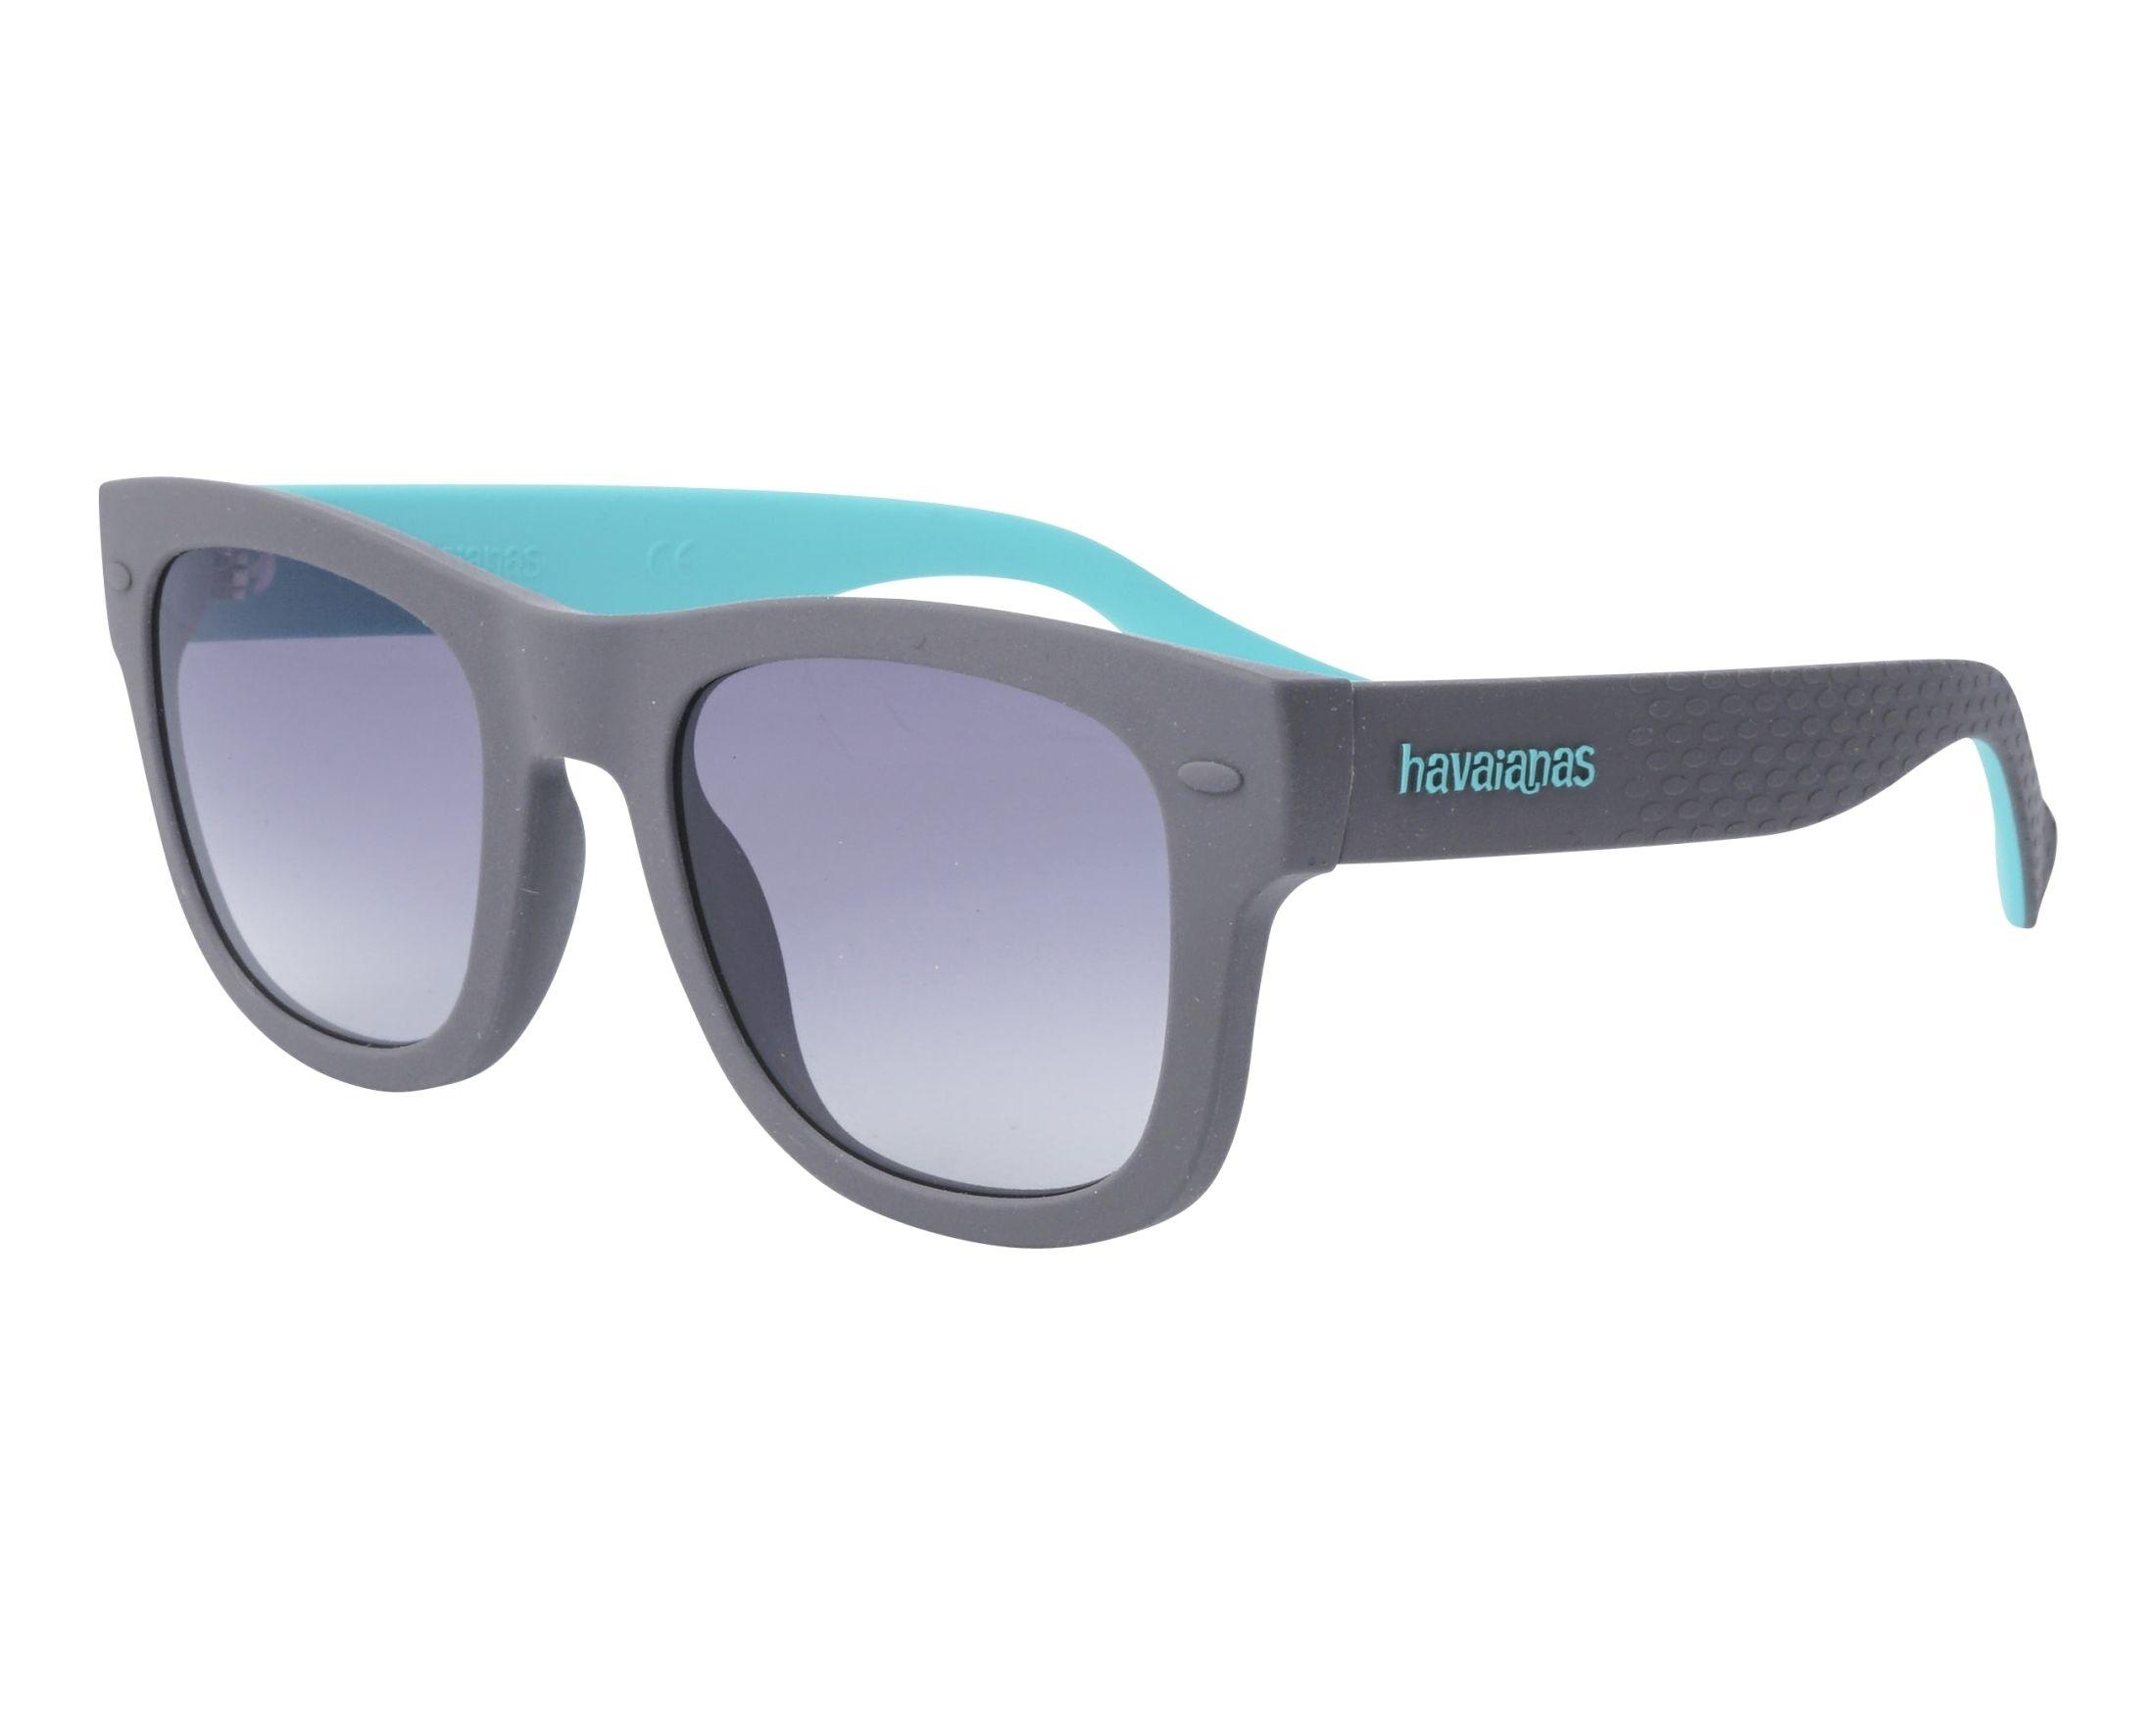 c8515c5248d30 Sunglasses Havaianas PARATY-M QKA9O 50-21 Grey Green profile view